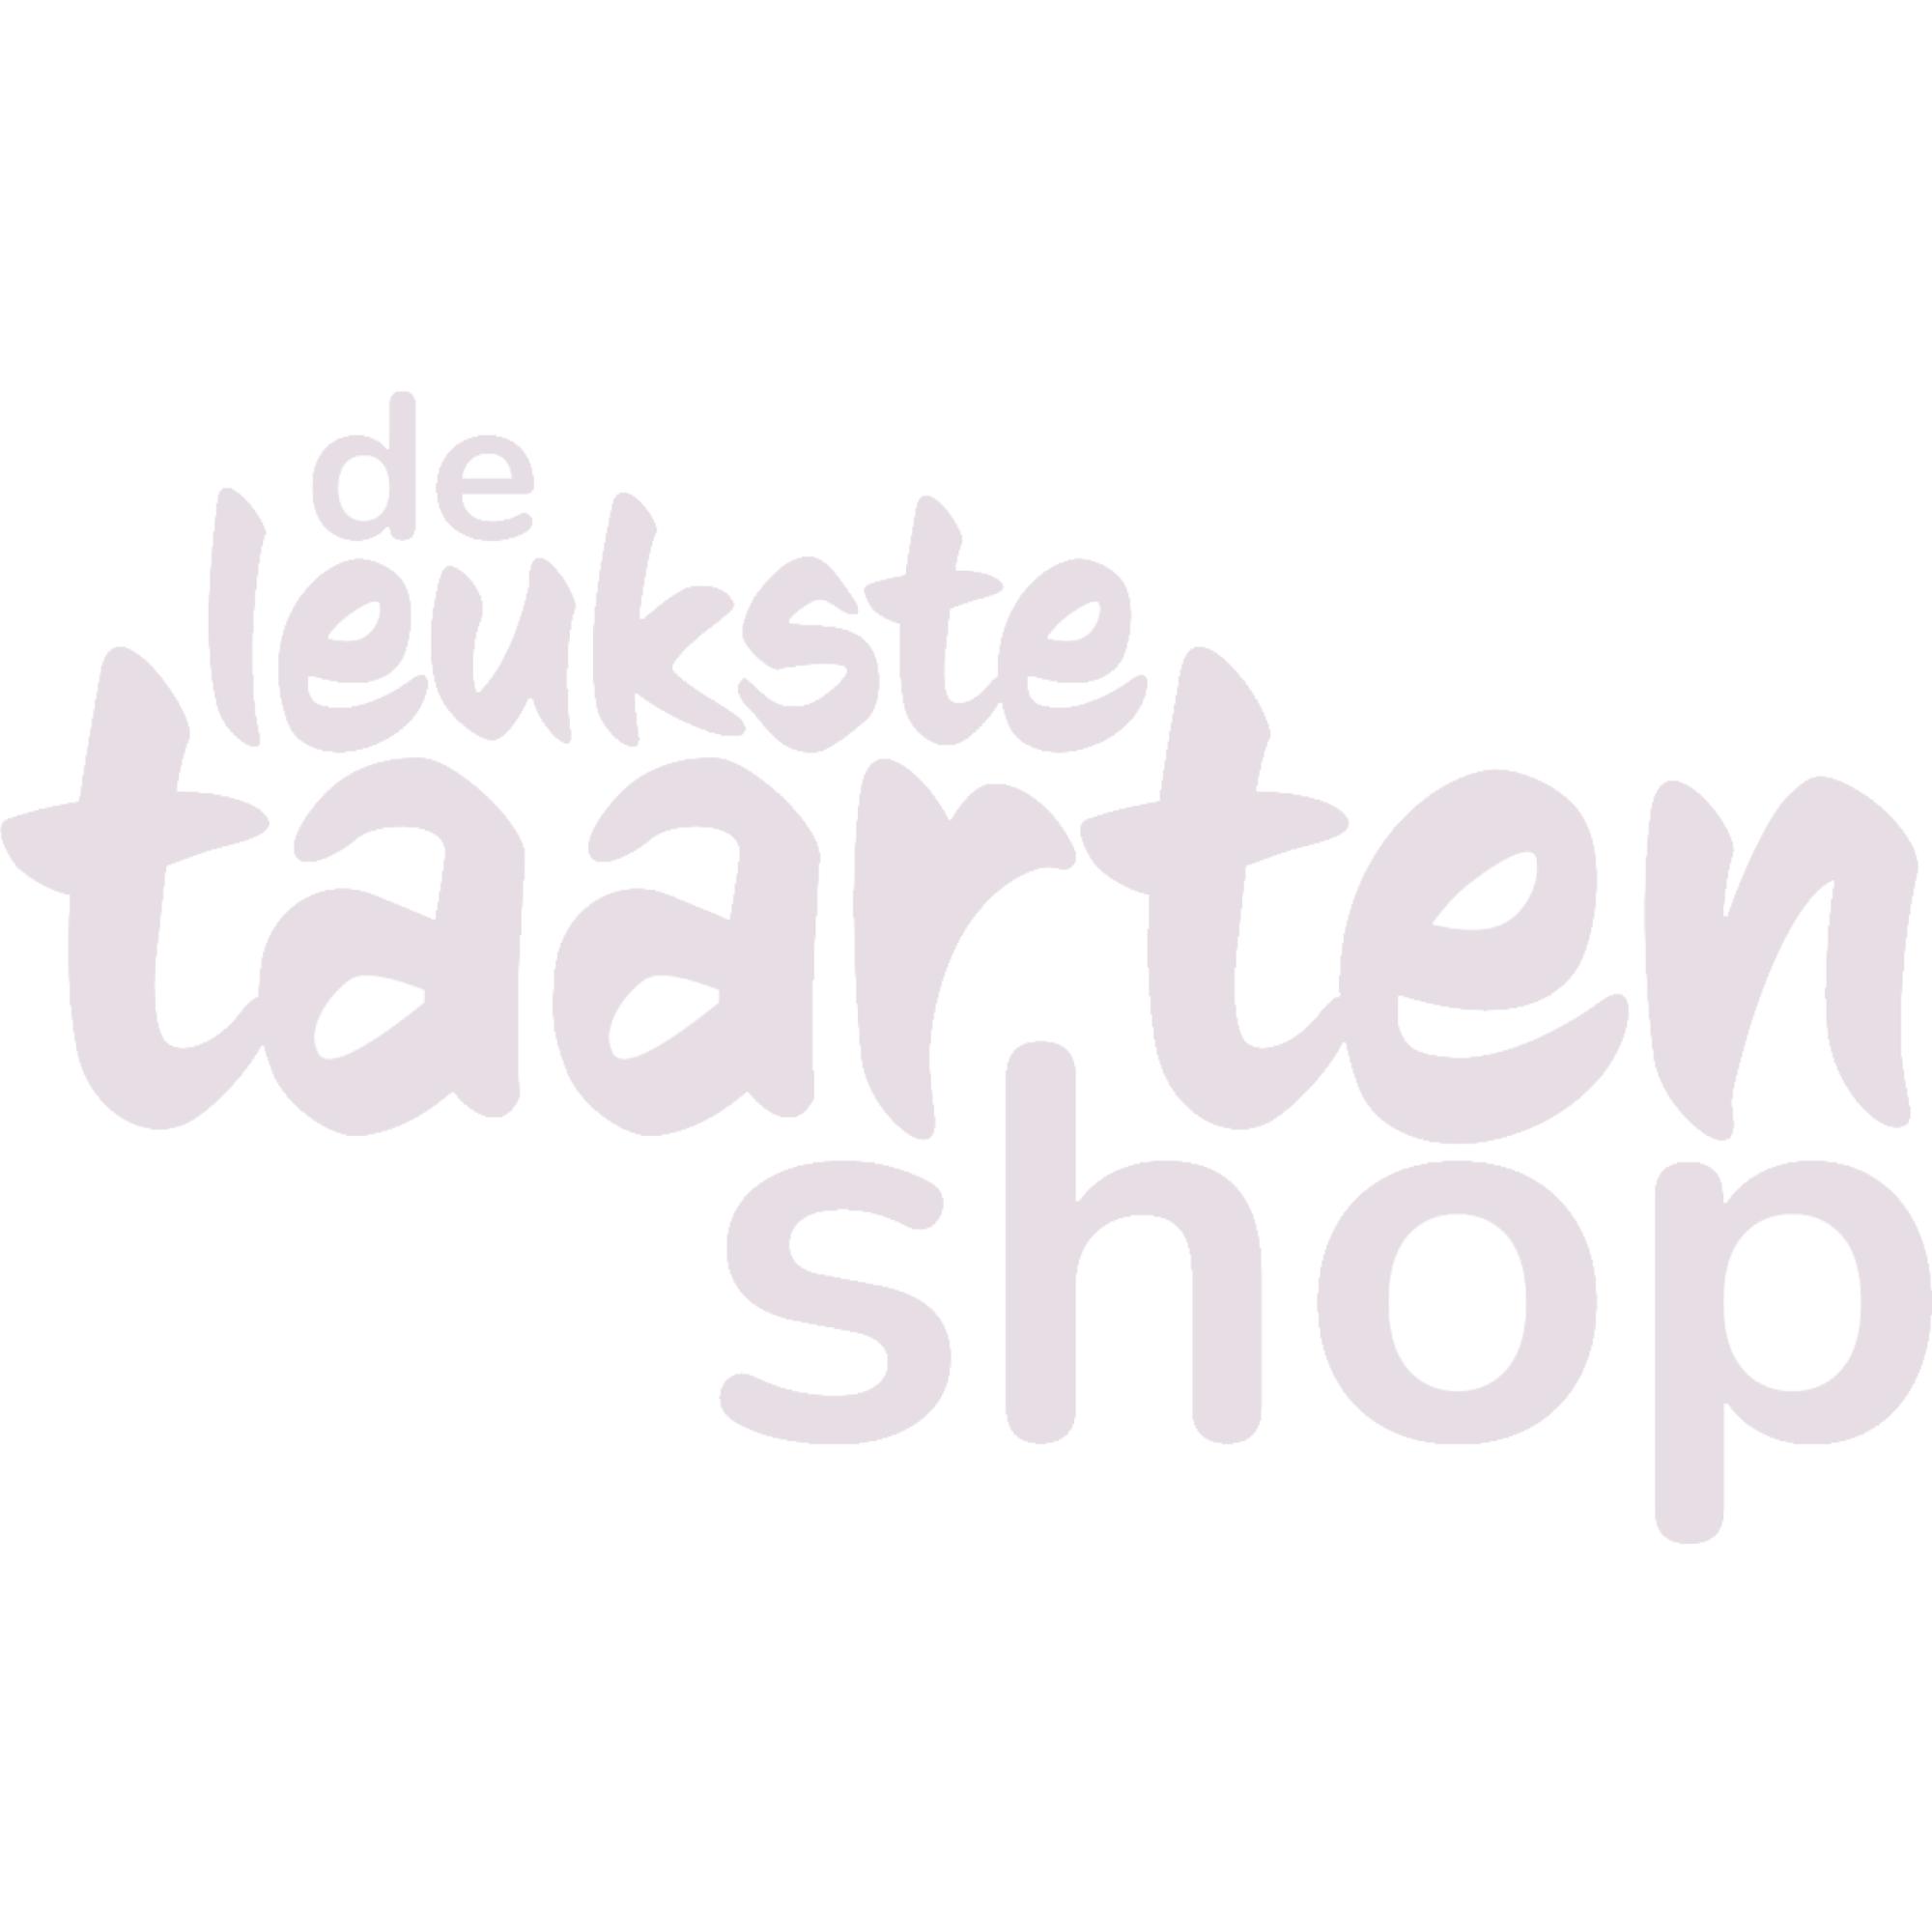 Spiksplinternieuw Recept: Sparkling Unicorn Taart | Deleukstetaartenshop.nl WF-67